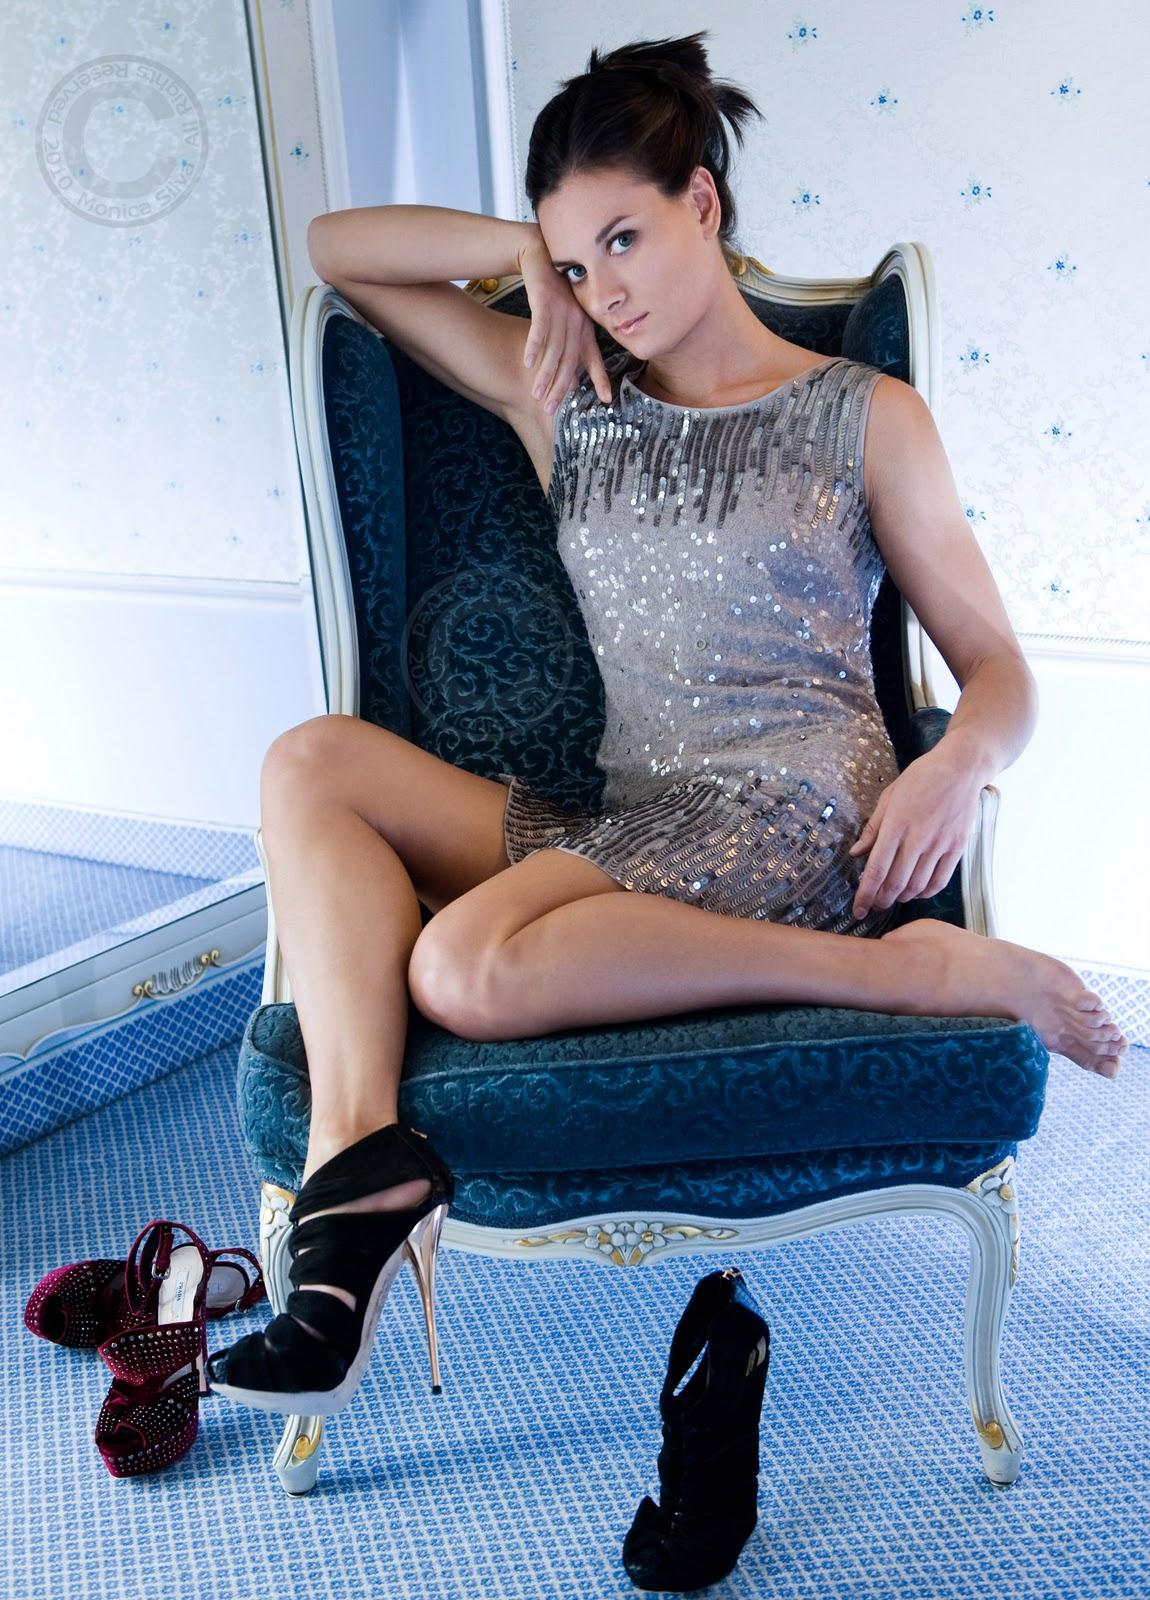 http://3.bp.blogspot.com/-ZHJLUAPSees/TsOIB9HY27I/AAAAAAAADRk/_EattpX28h8/s1600/Yelena-Isinbayeva-02.jpg